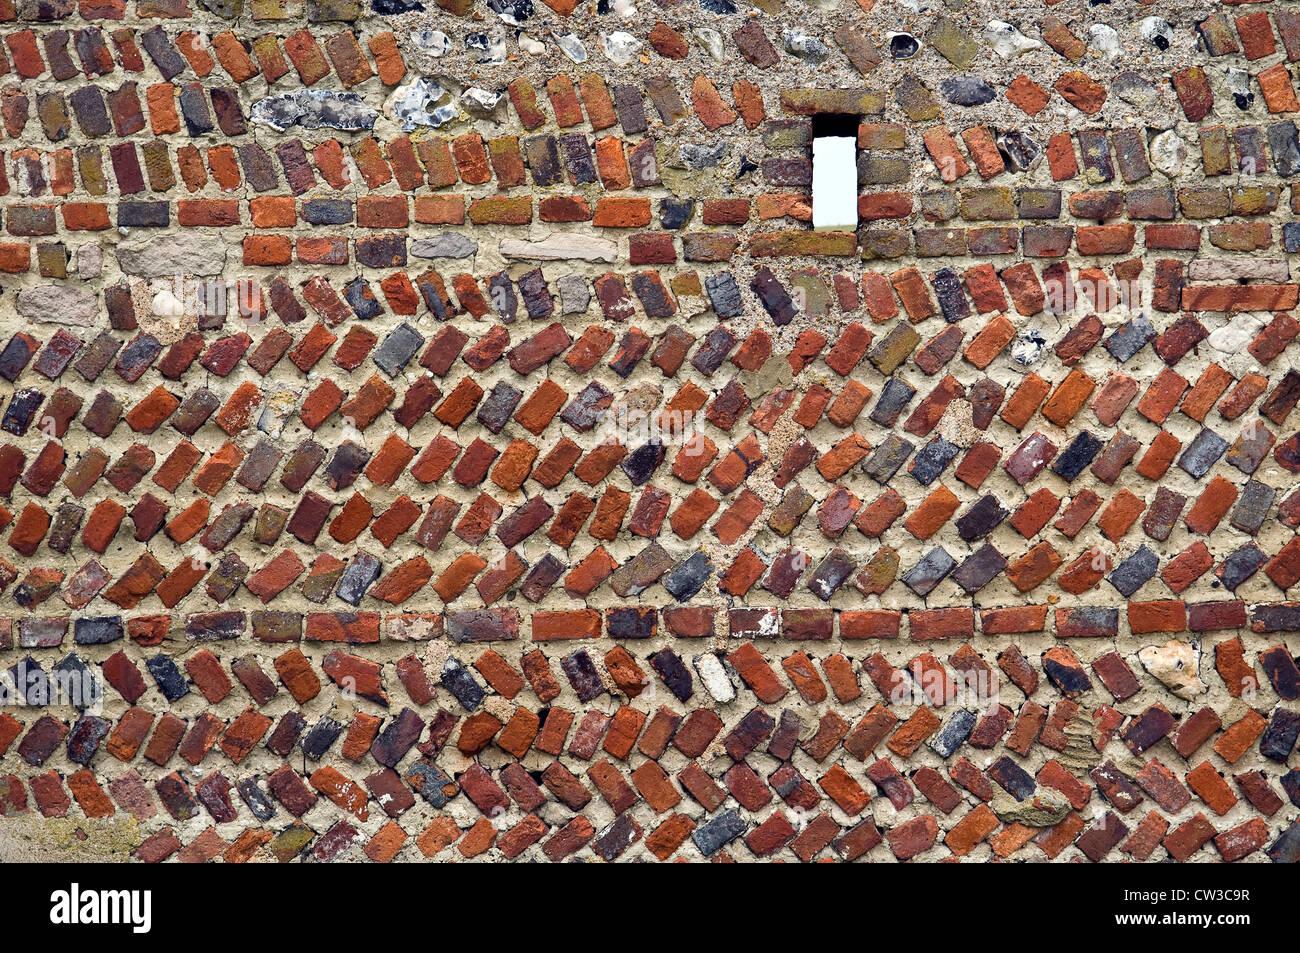 Mixed Brick And Stonework Wall At The Old Rathfinny